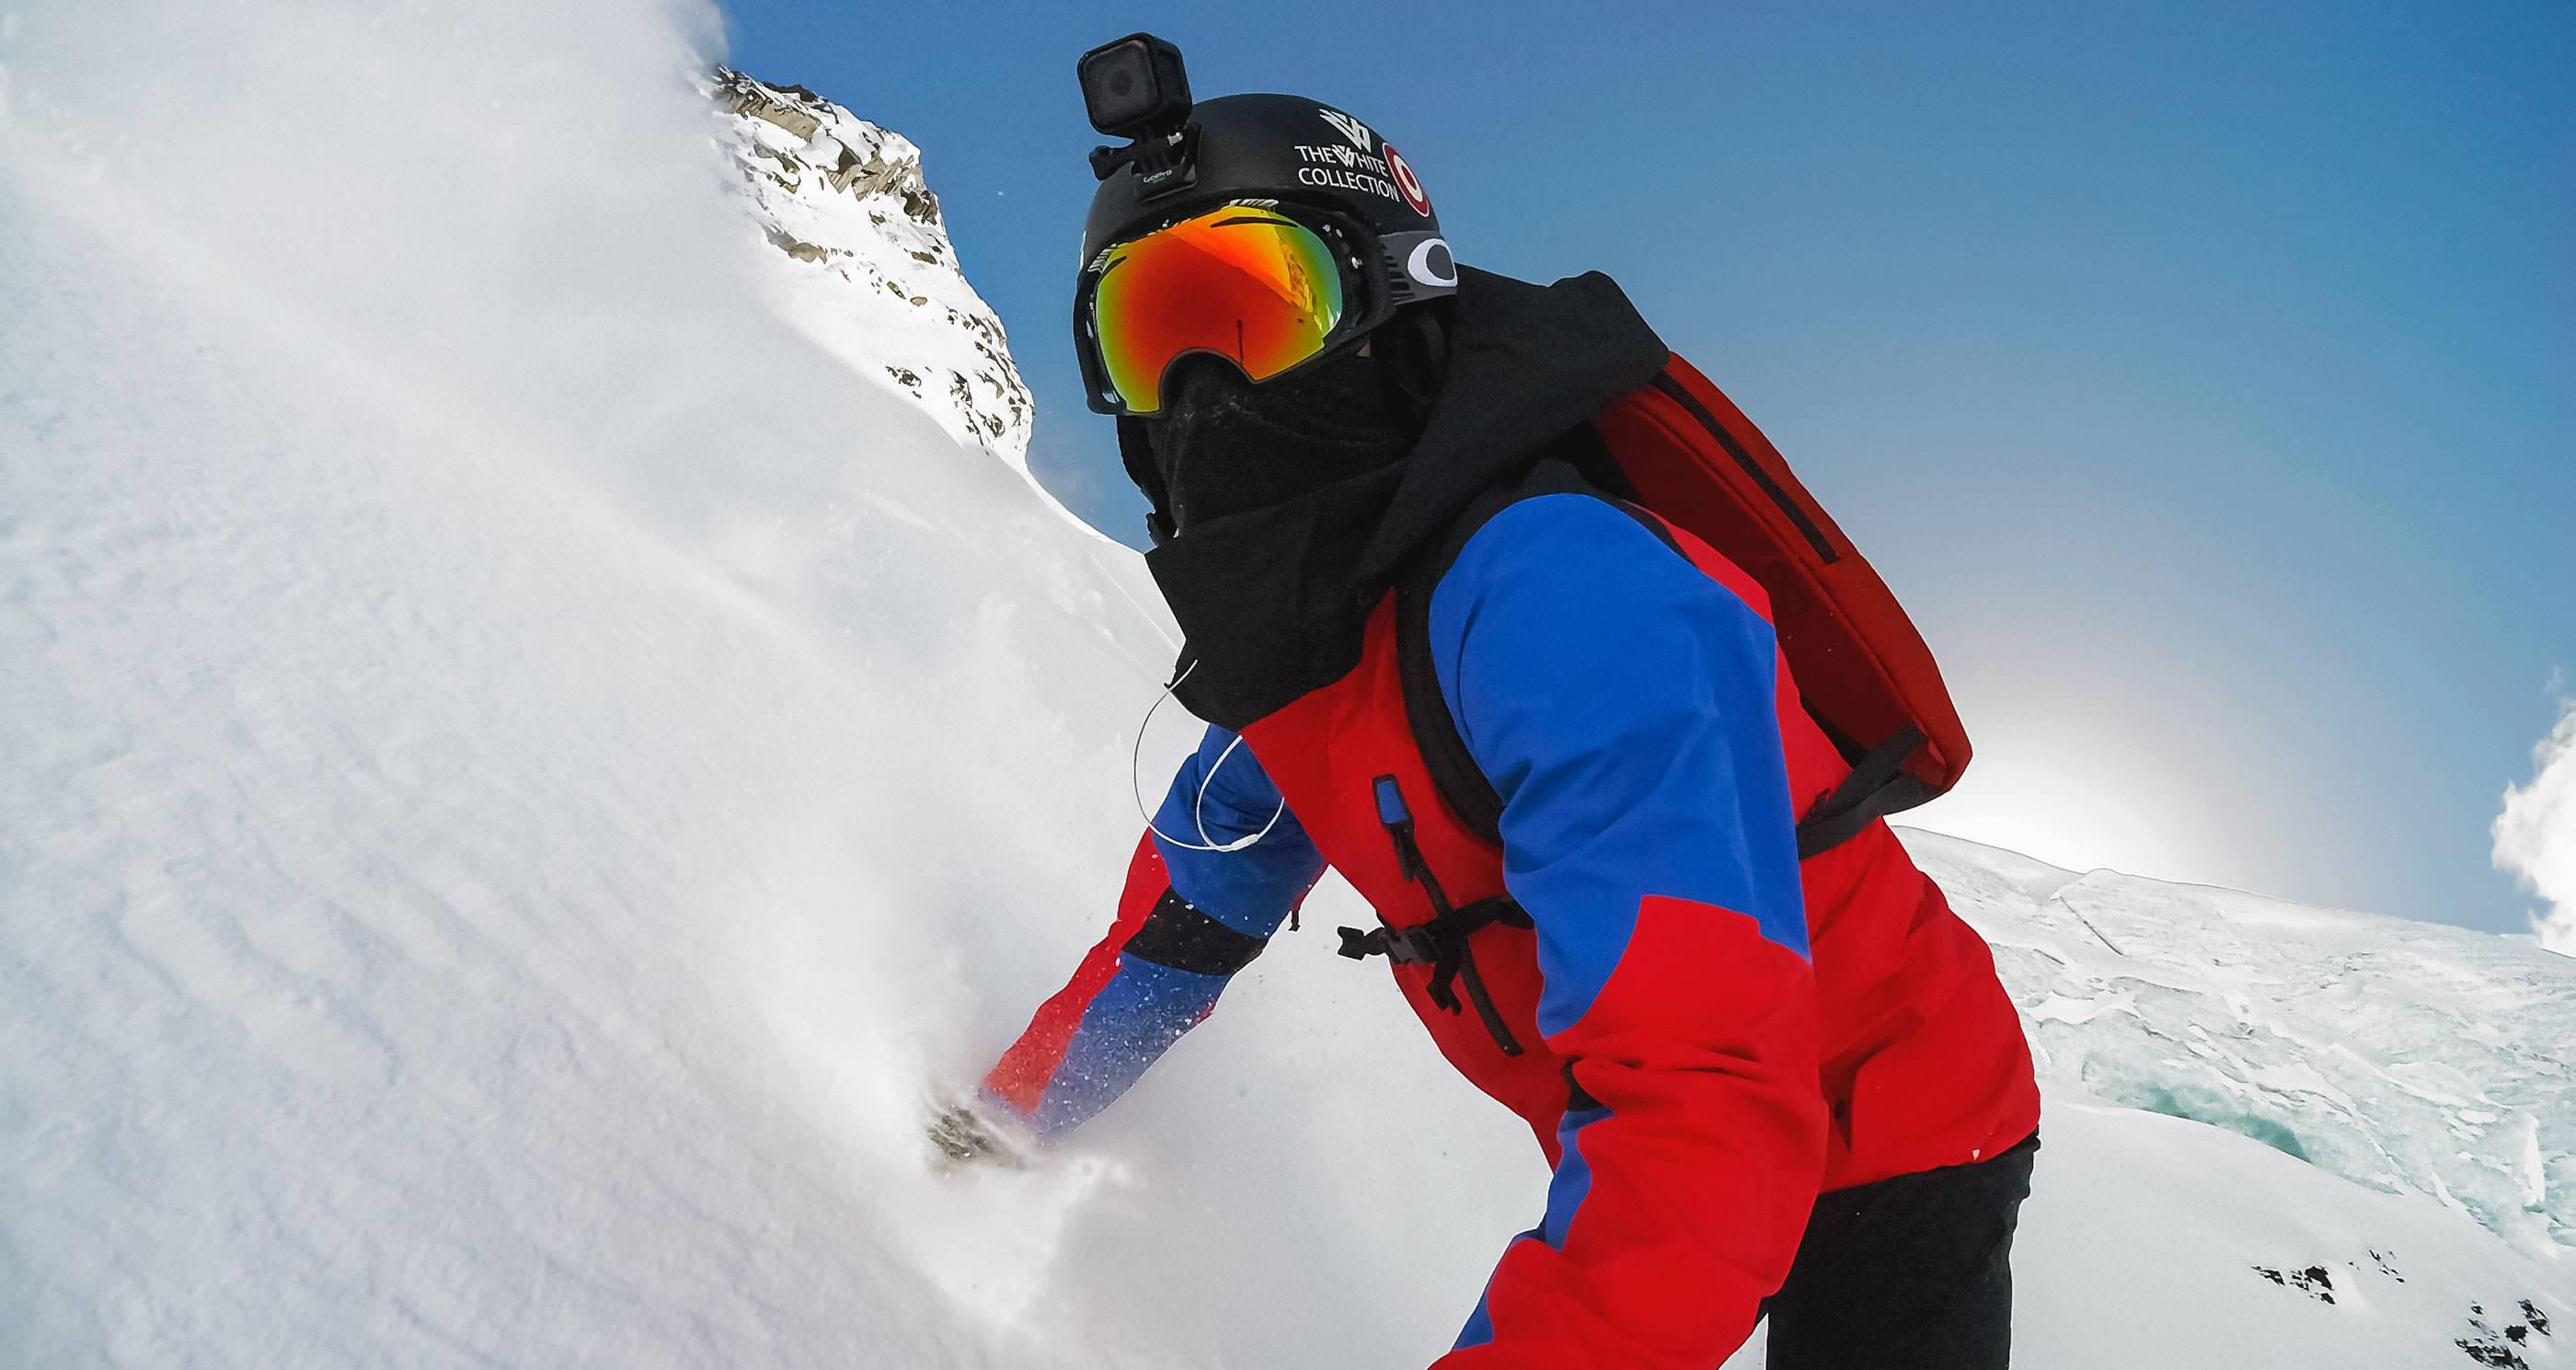 gopro-hero4-session-action-camera-shot